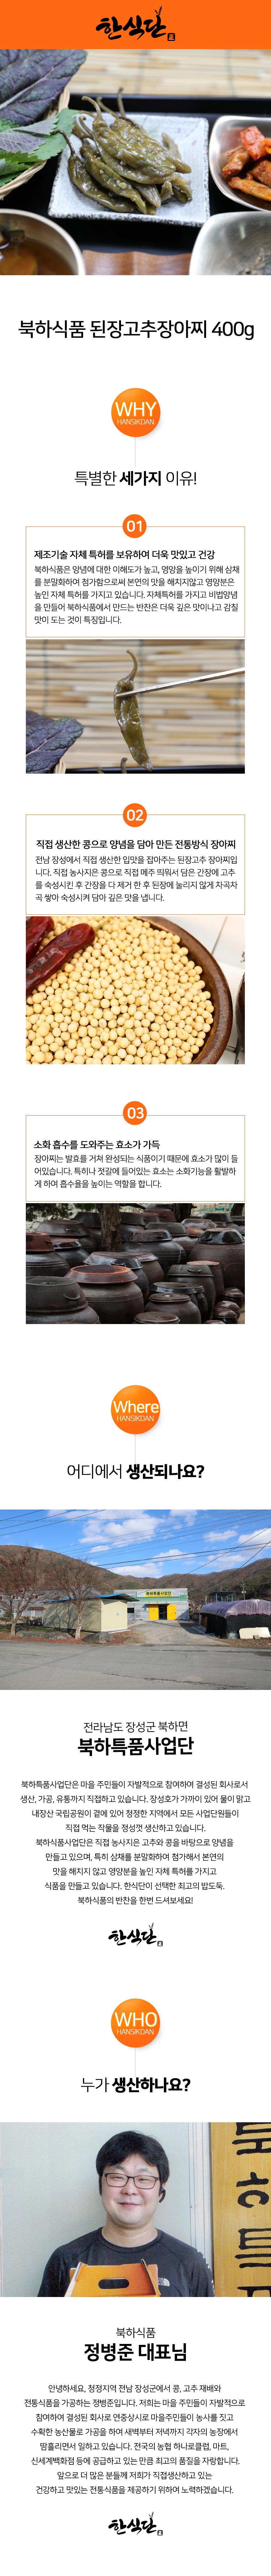 35_page_01_d.jpg